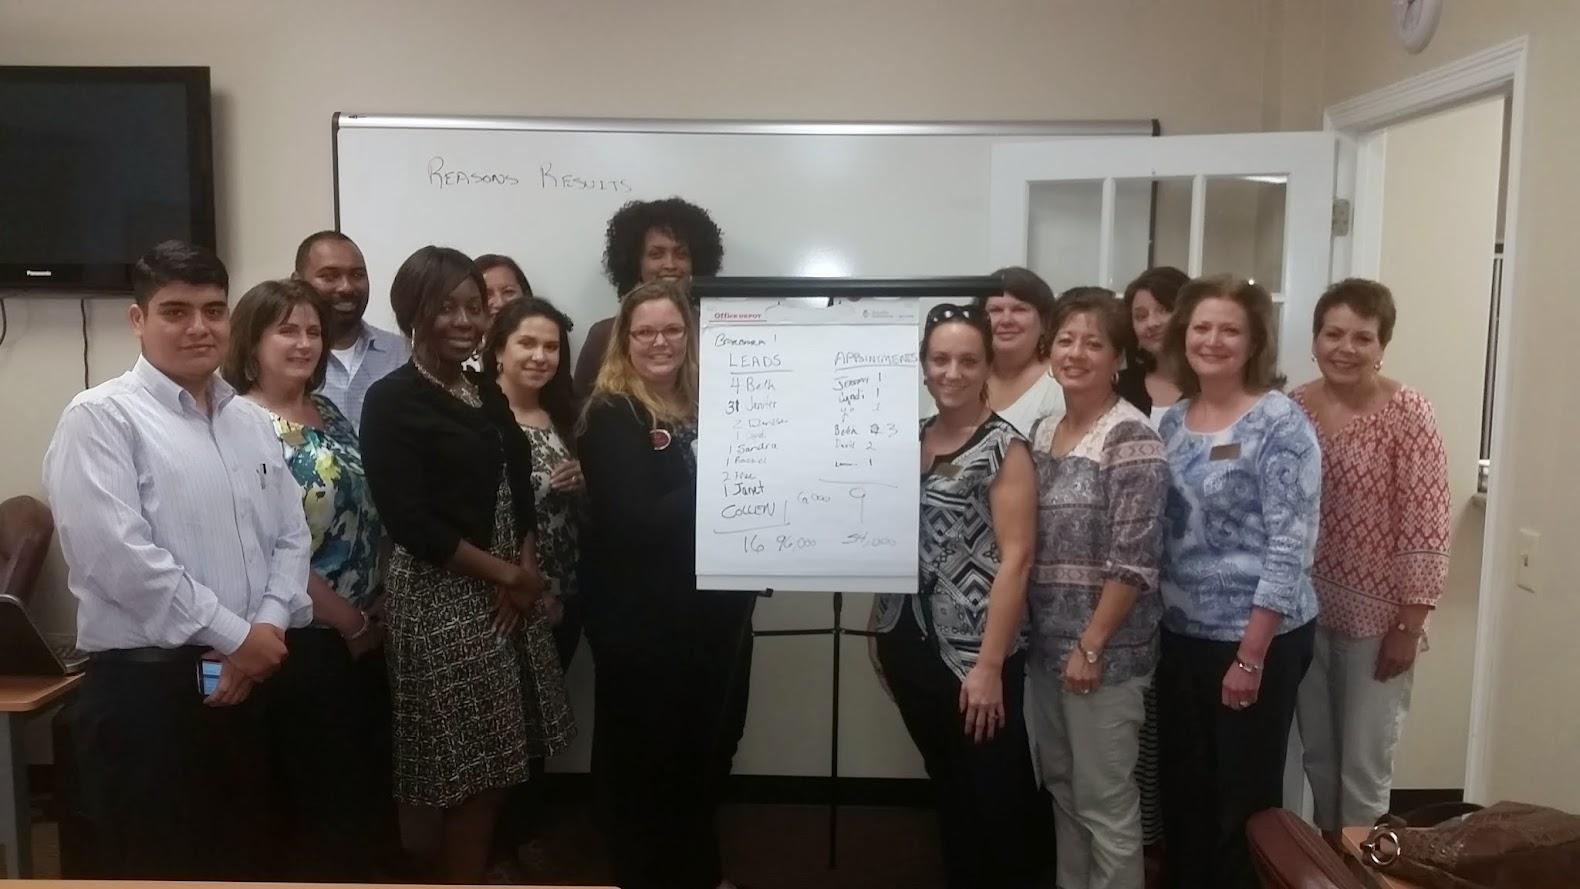 Keller Williams Realty Northeast Productivity Coaching Program Kingwood Humble Atascocita Texas